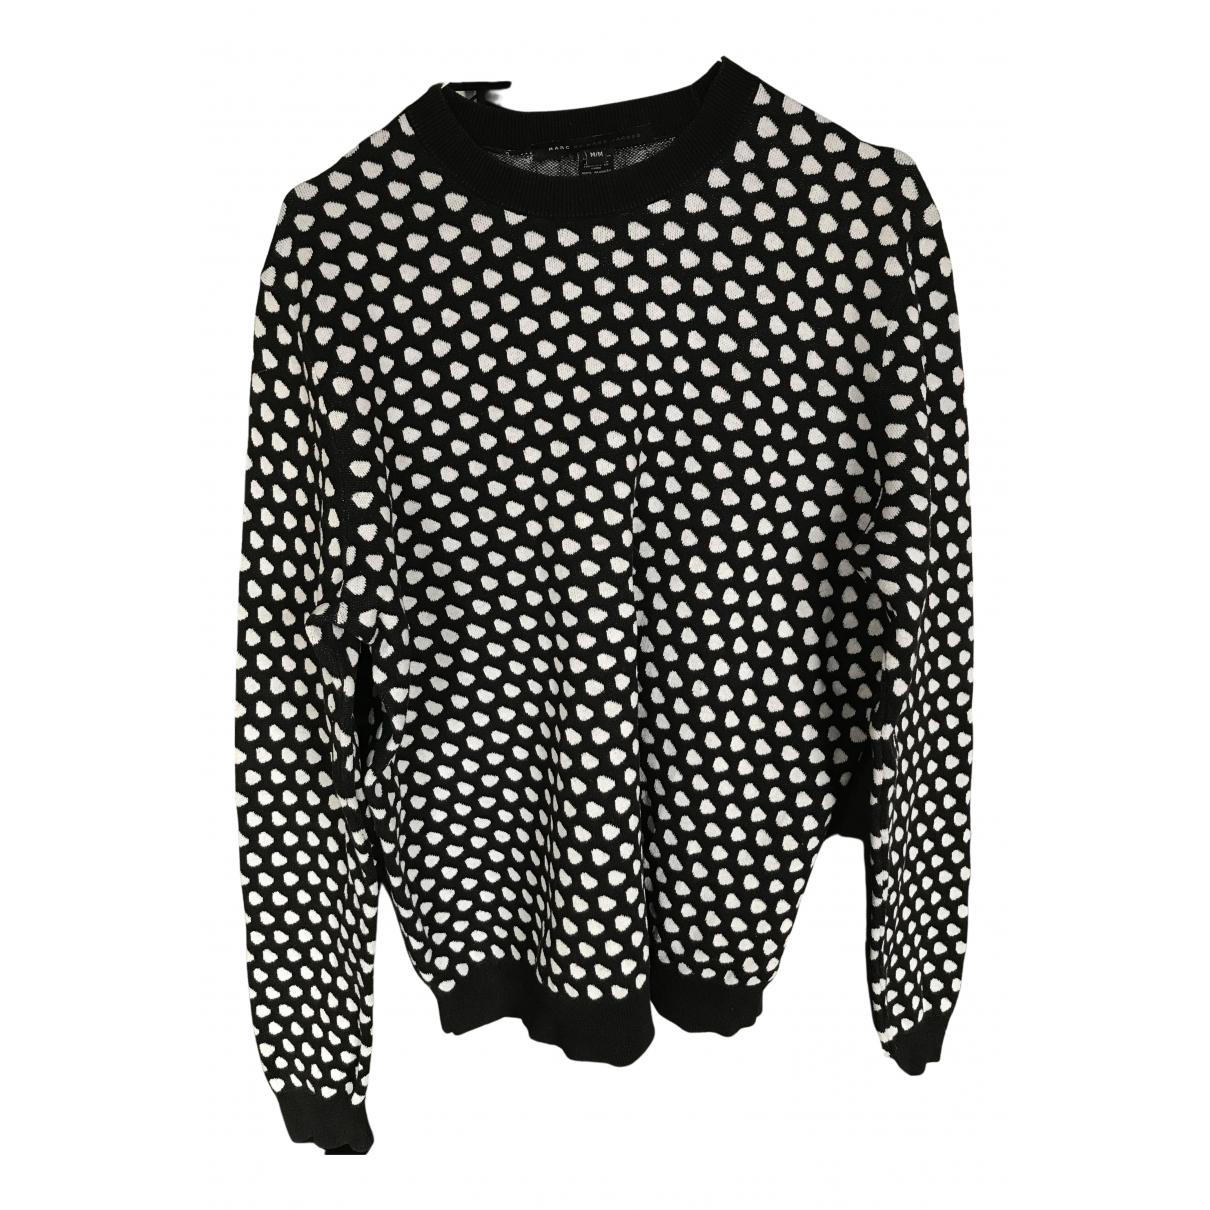 Marc By Marc Jacobs N Black Cotton Knitwear & Sweatshirts for Men M International